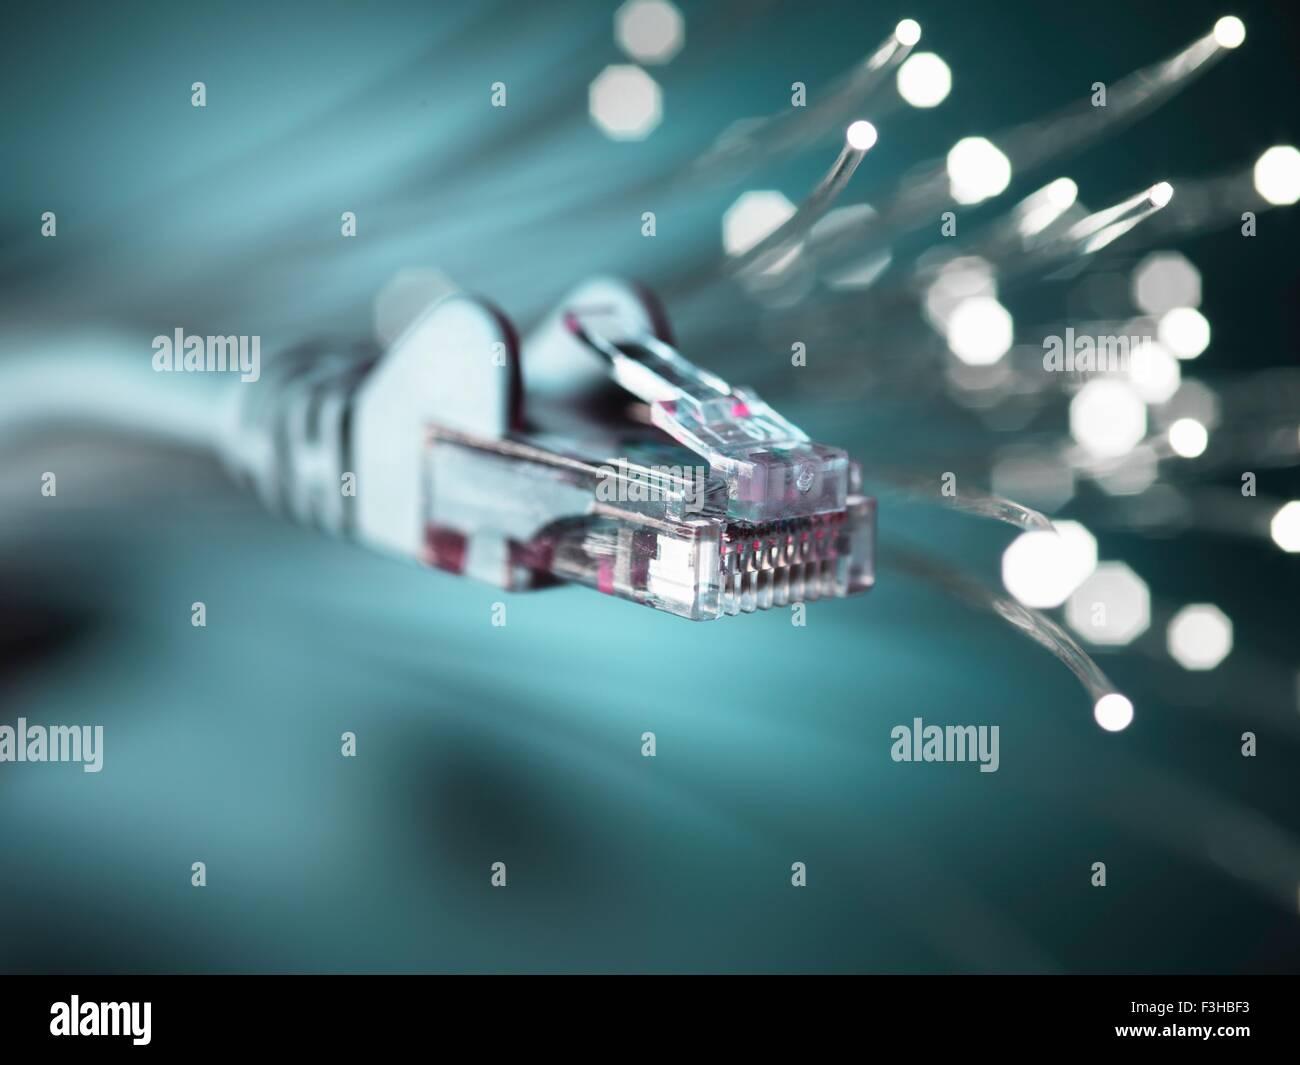 Internet-Netzwerk-Connector mit Faseroptik, Nahaufnahme Stockbild